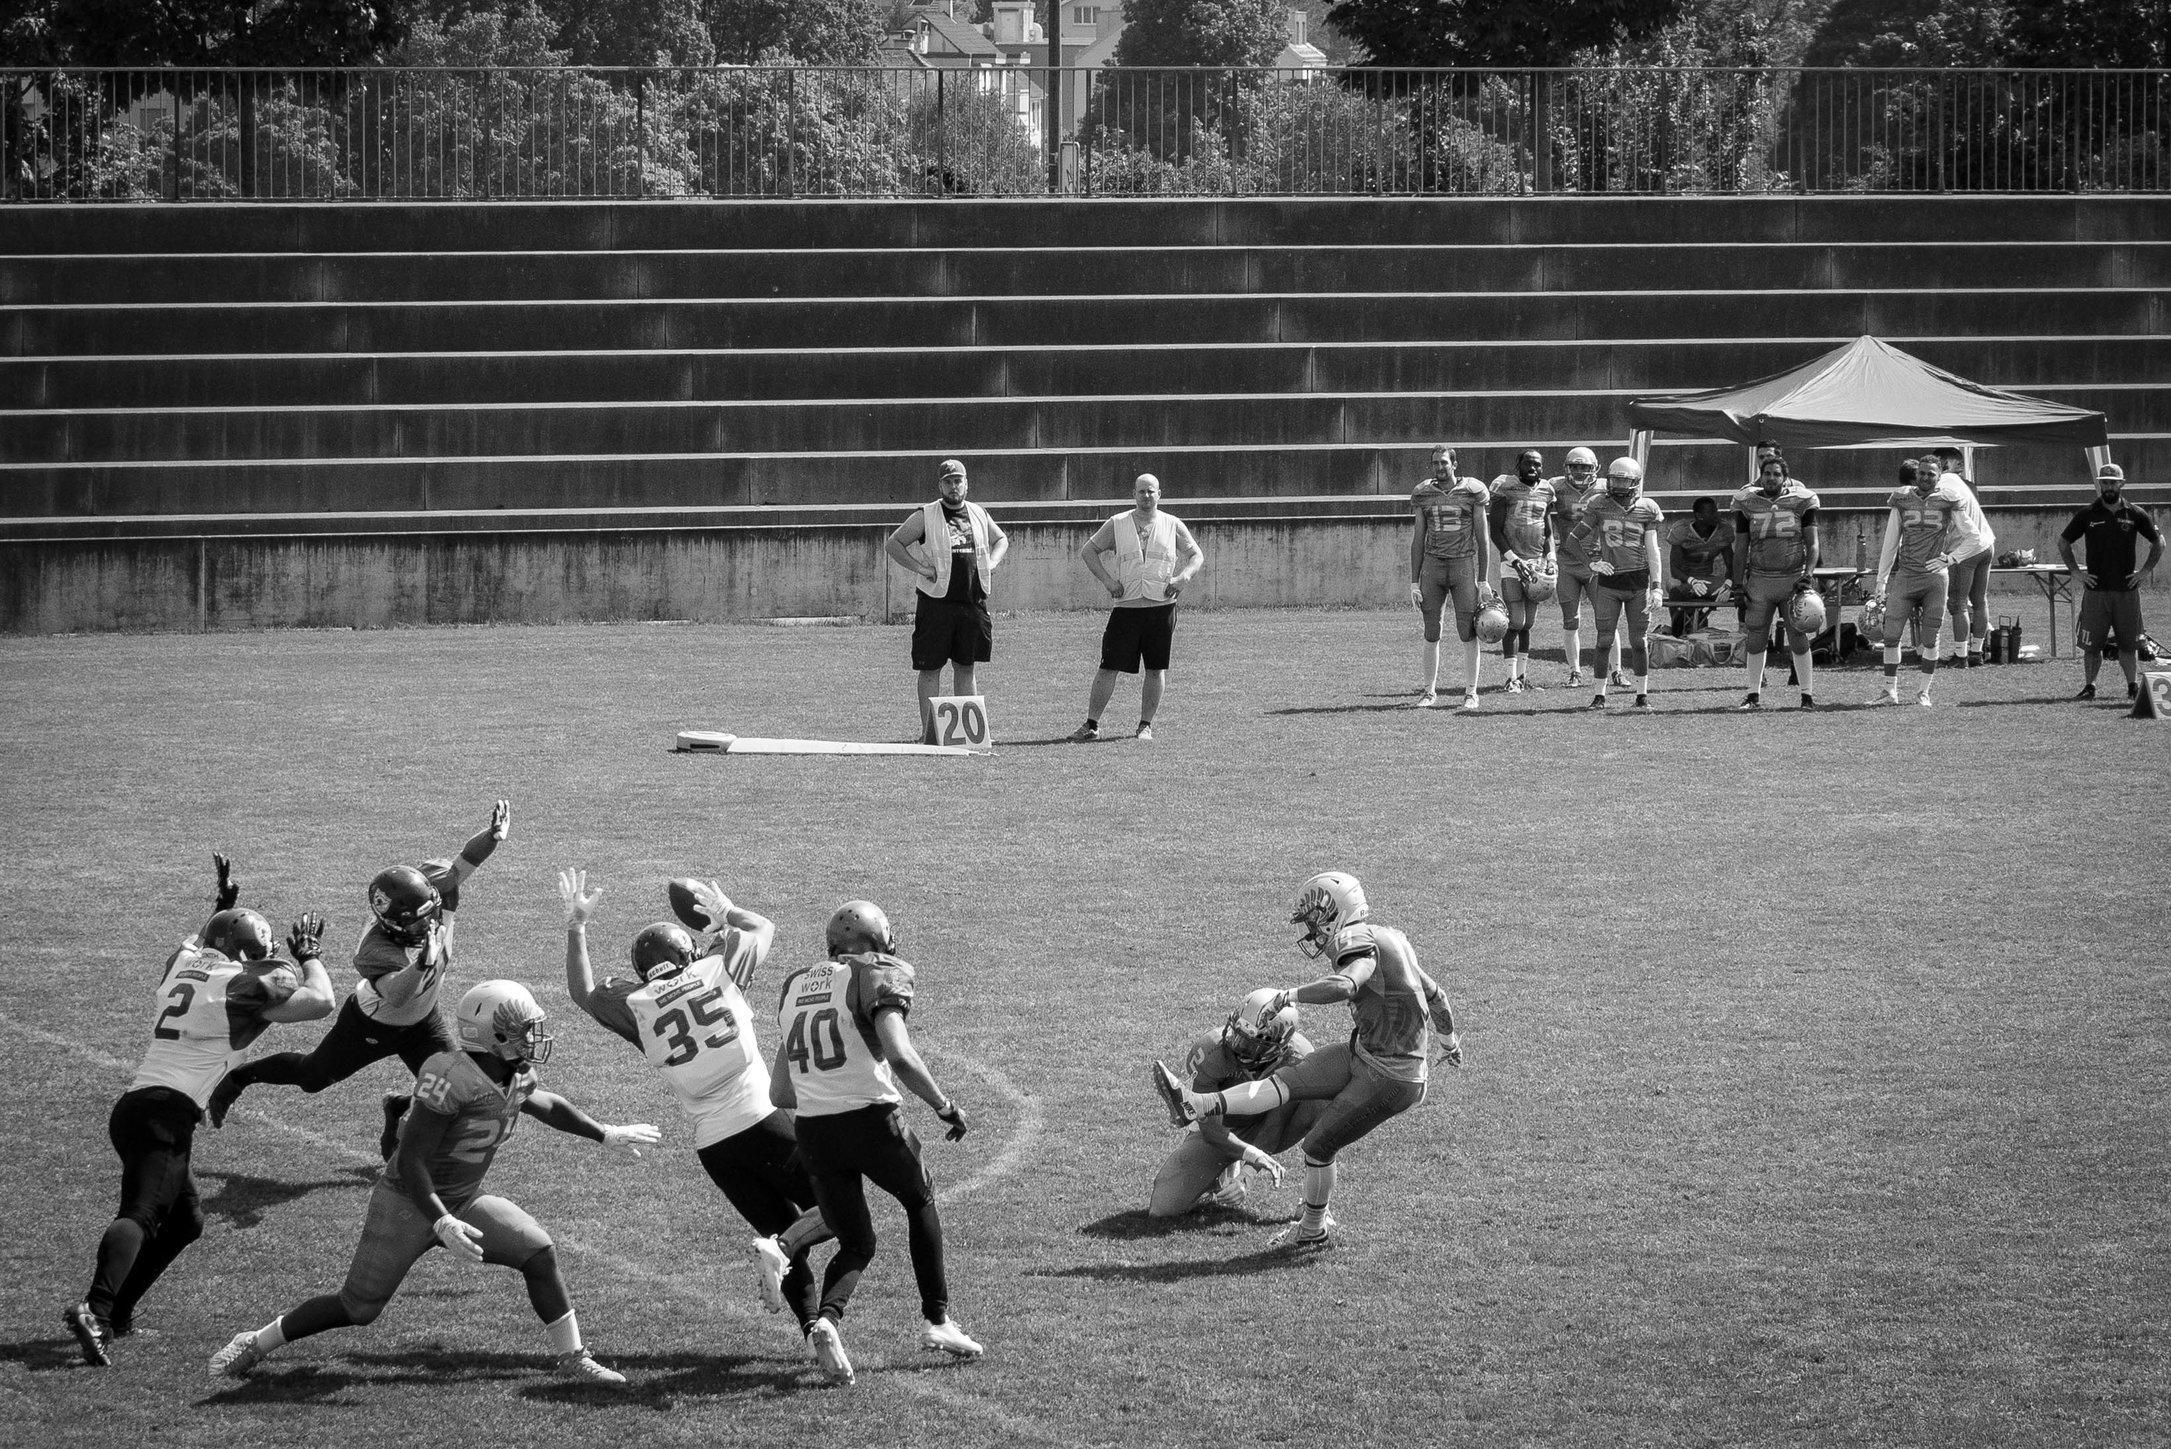 Kick it like Janikowski